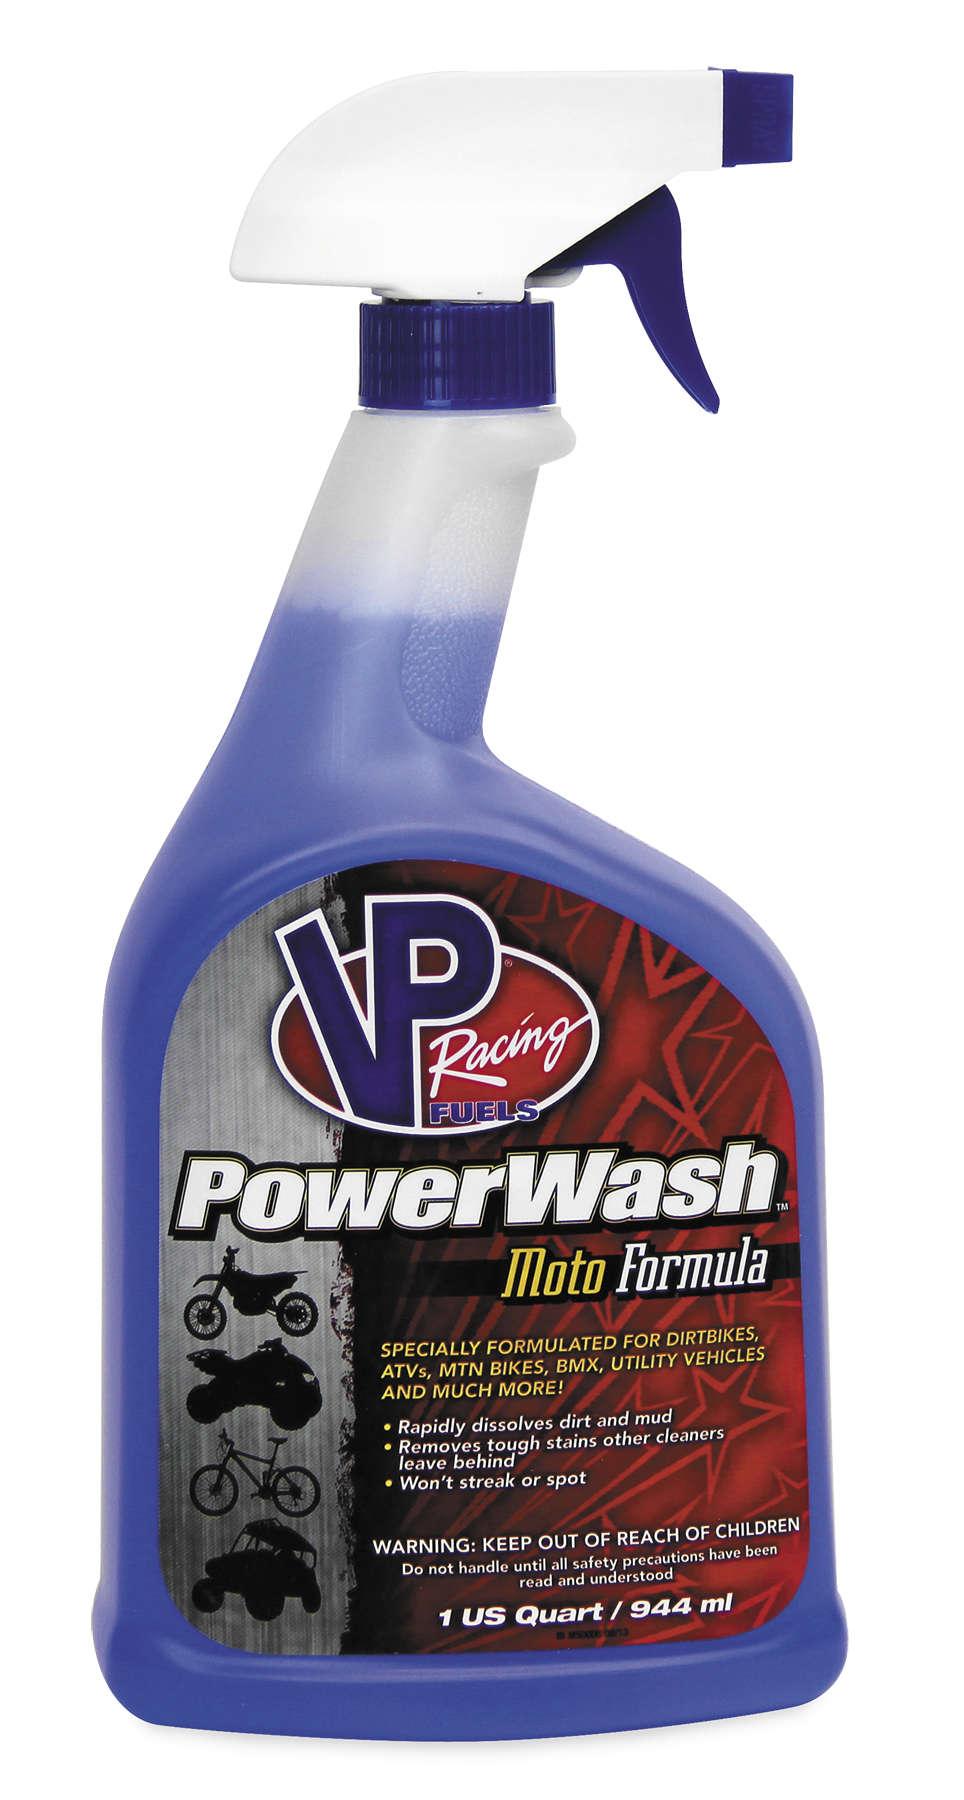 VP CHEMICLS Powerwash Moto Formula